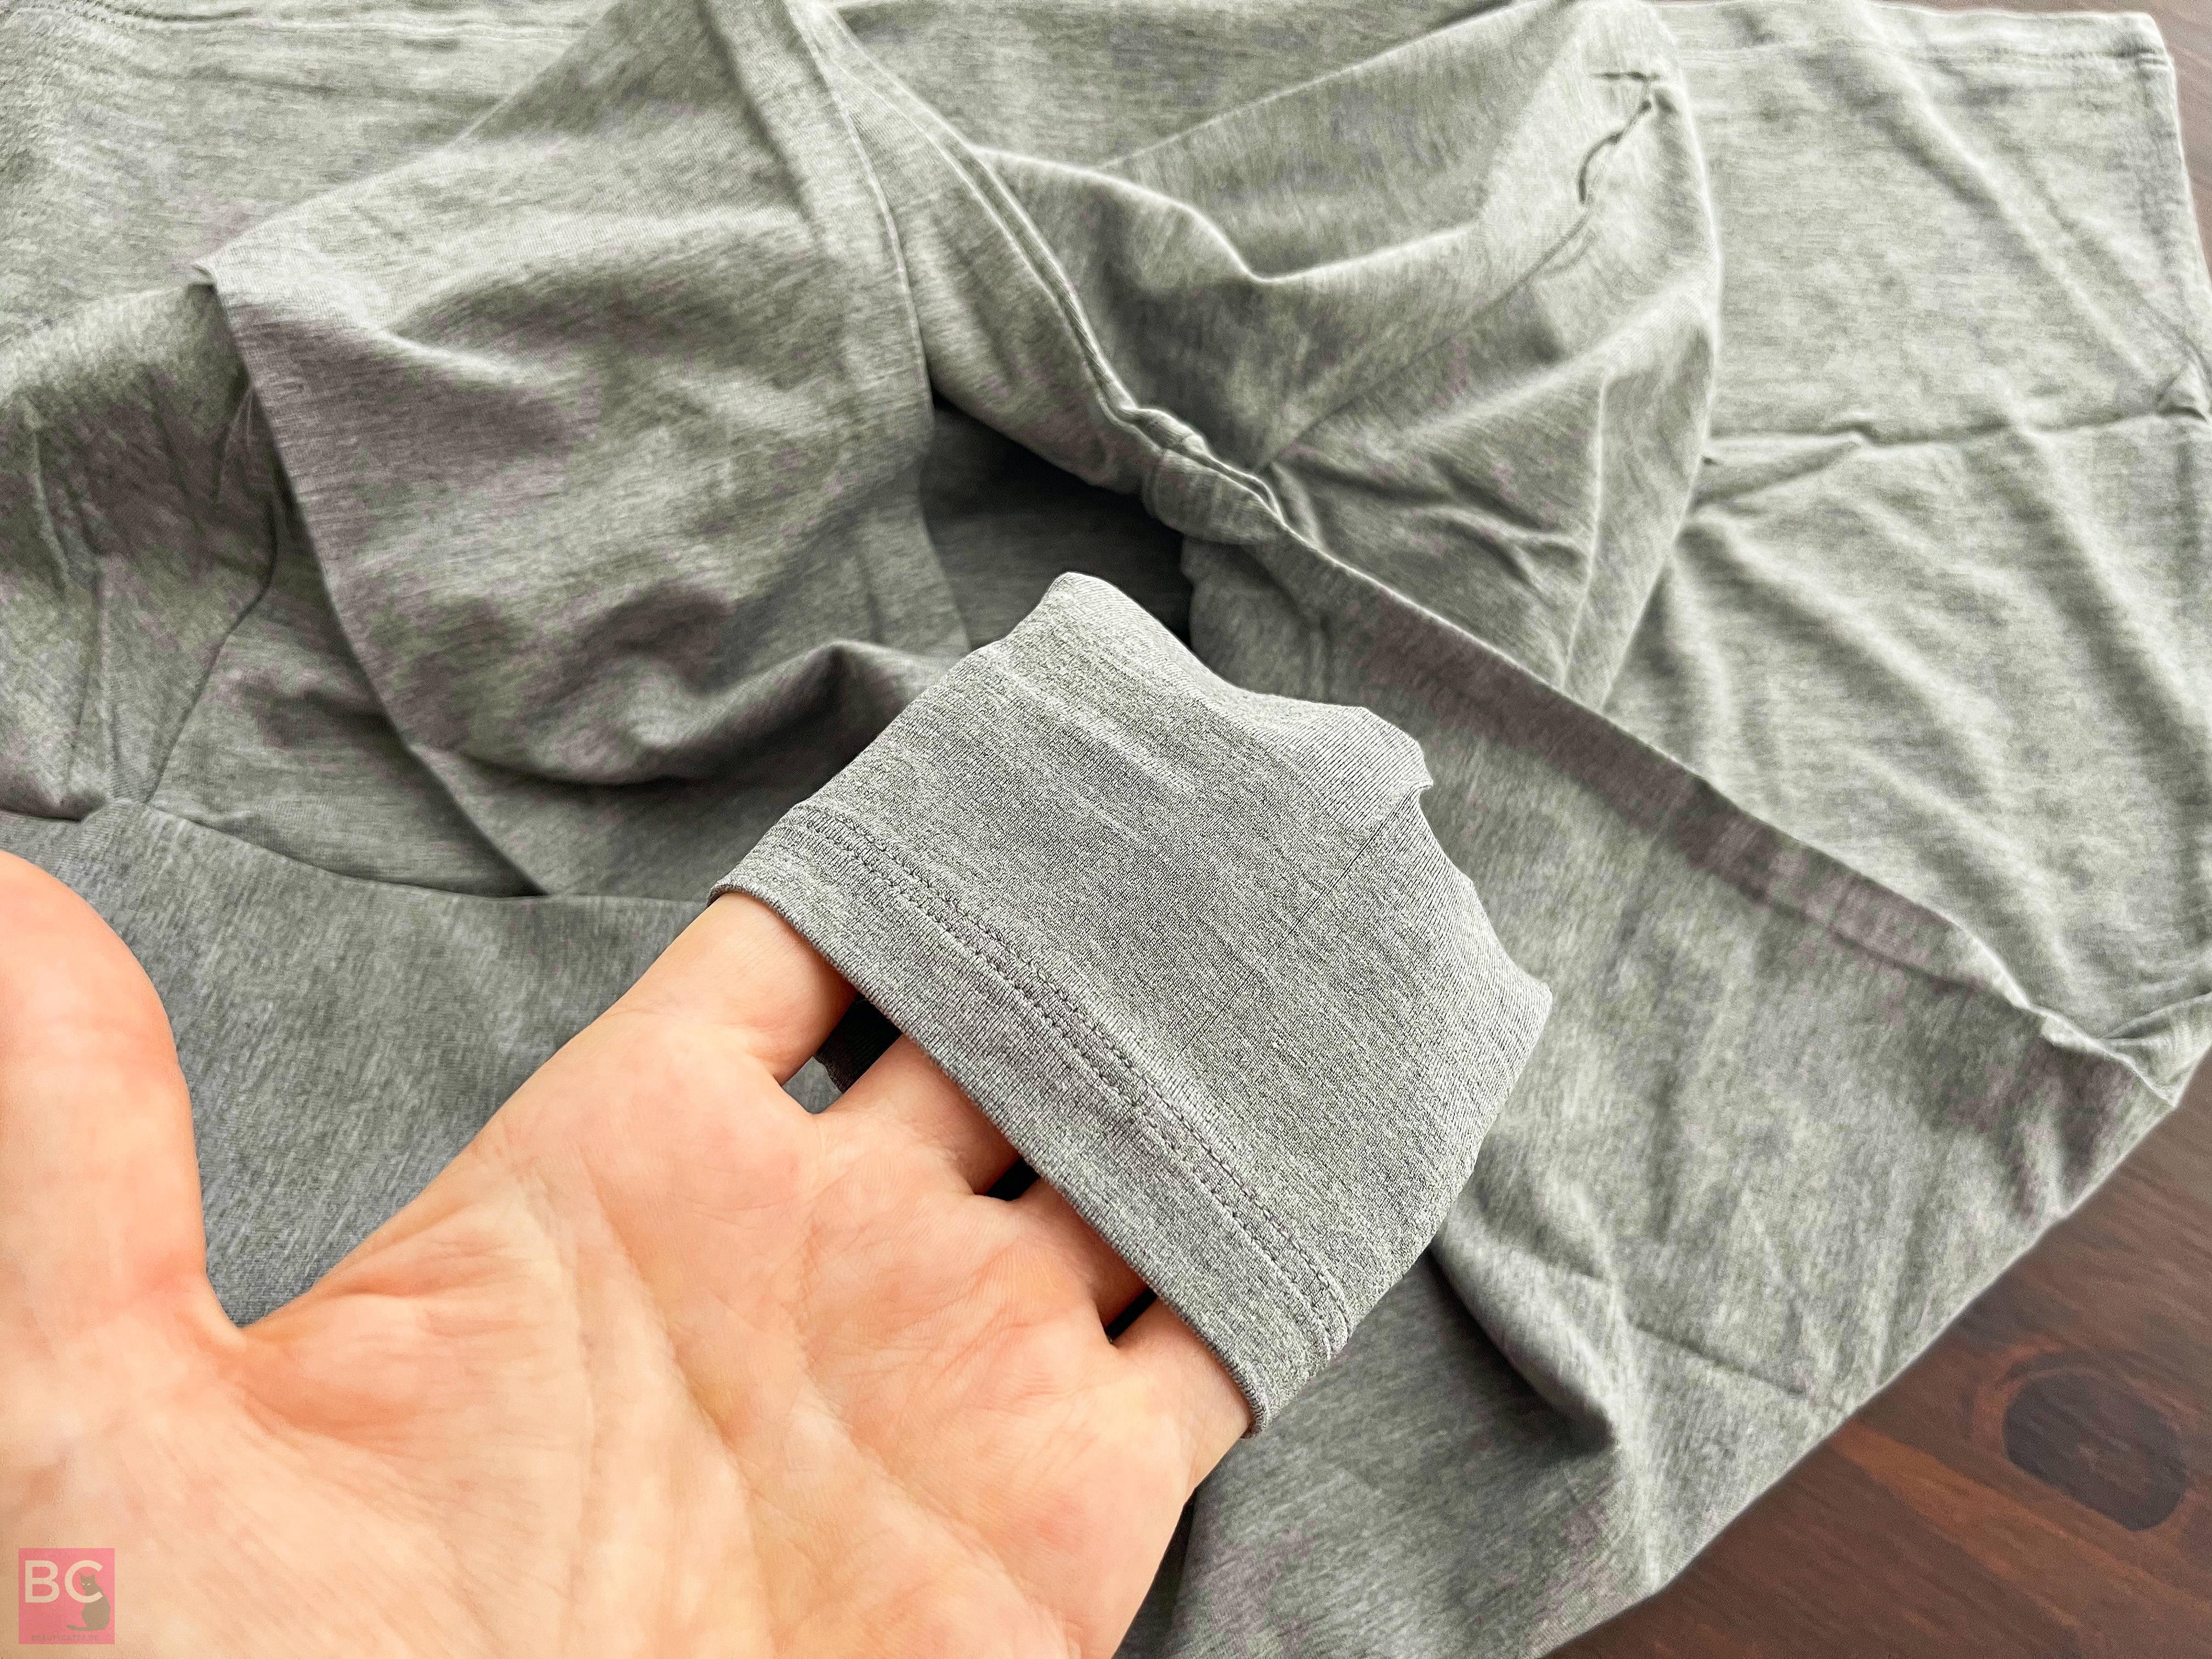 The Mia Shirt Les Lunes Erfahrungen Details Ärmel Nähte verarbeitet frisch ausgepackt